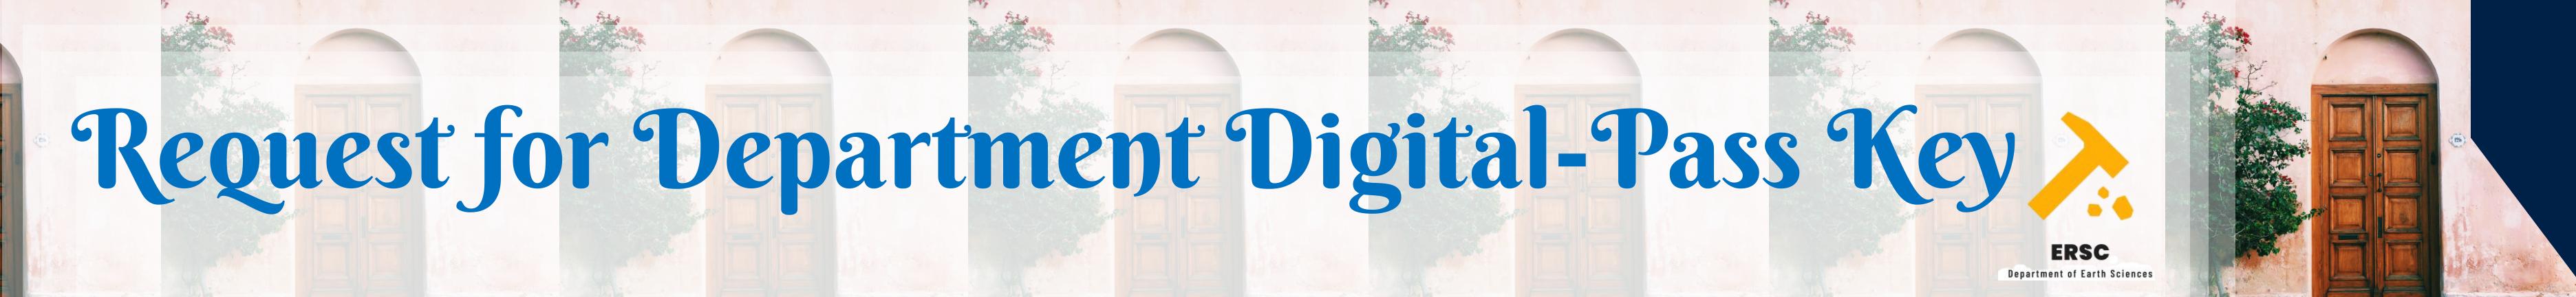 Digital Pass-Key